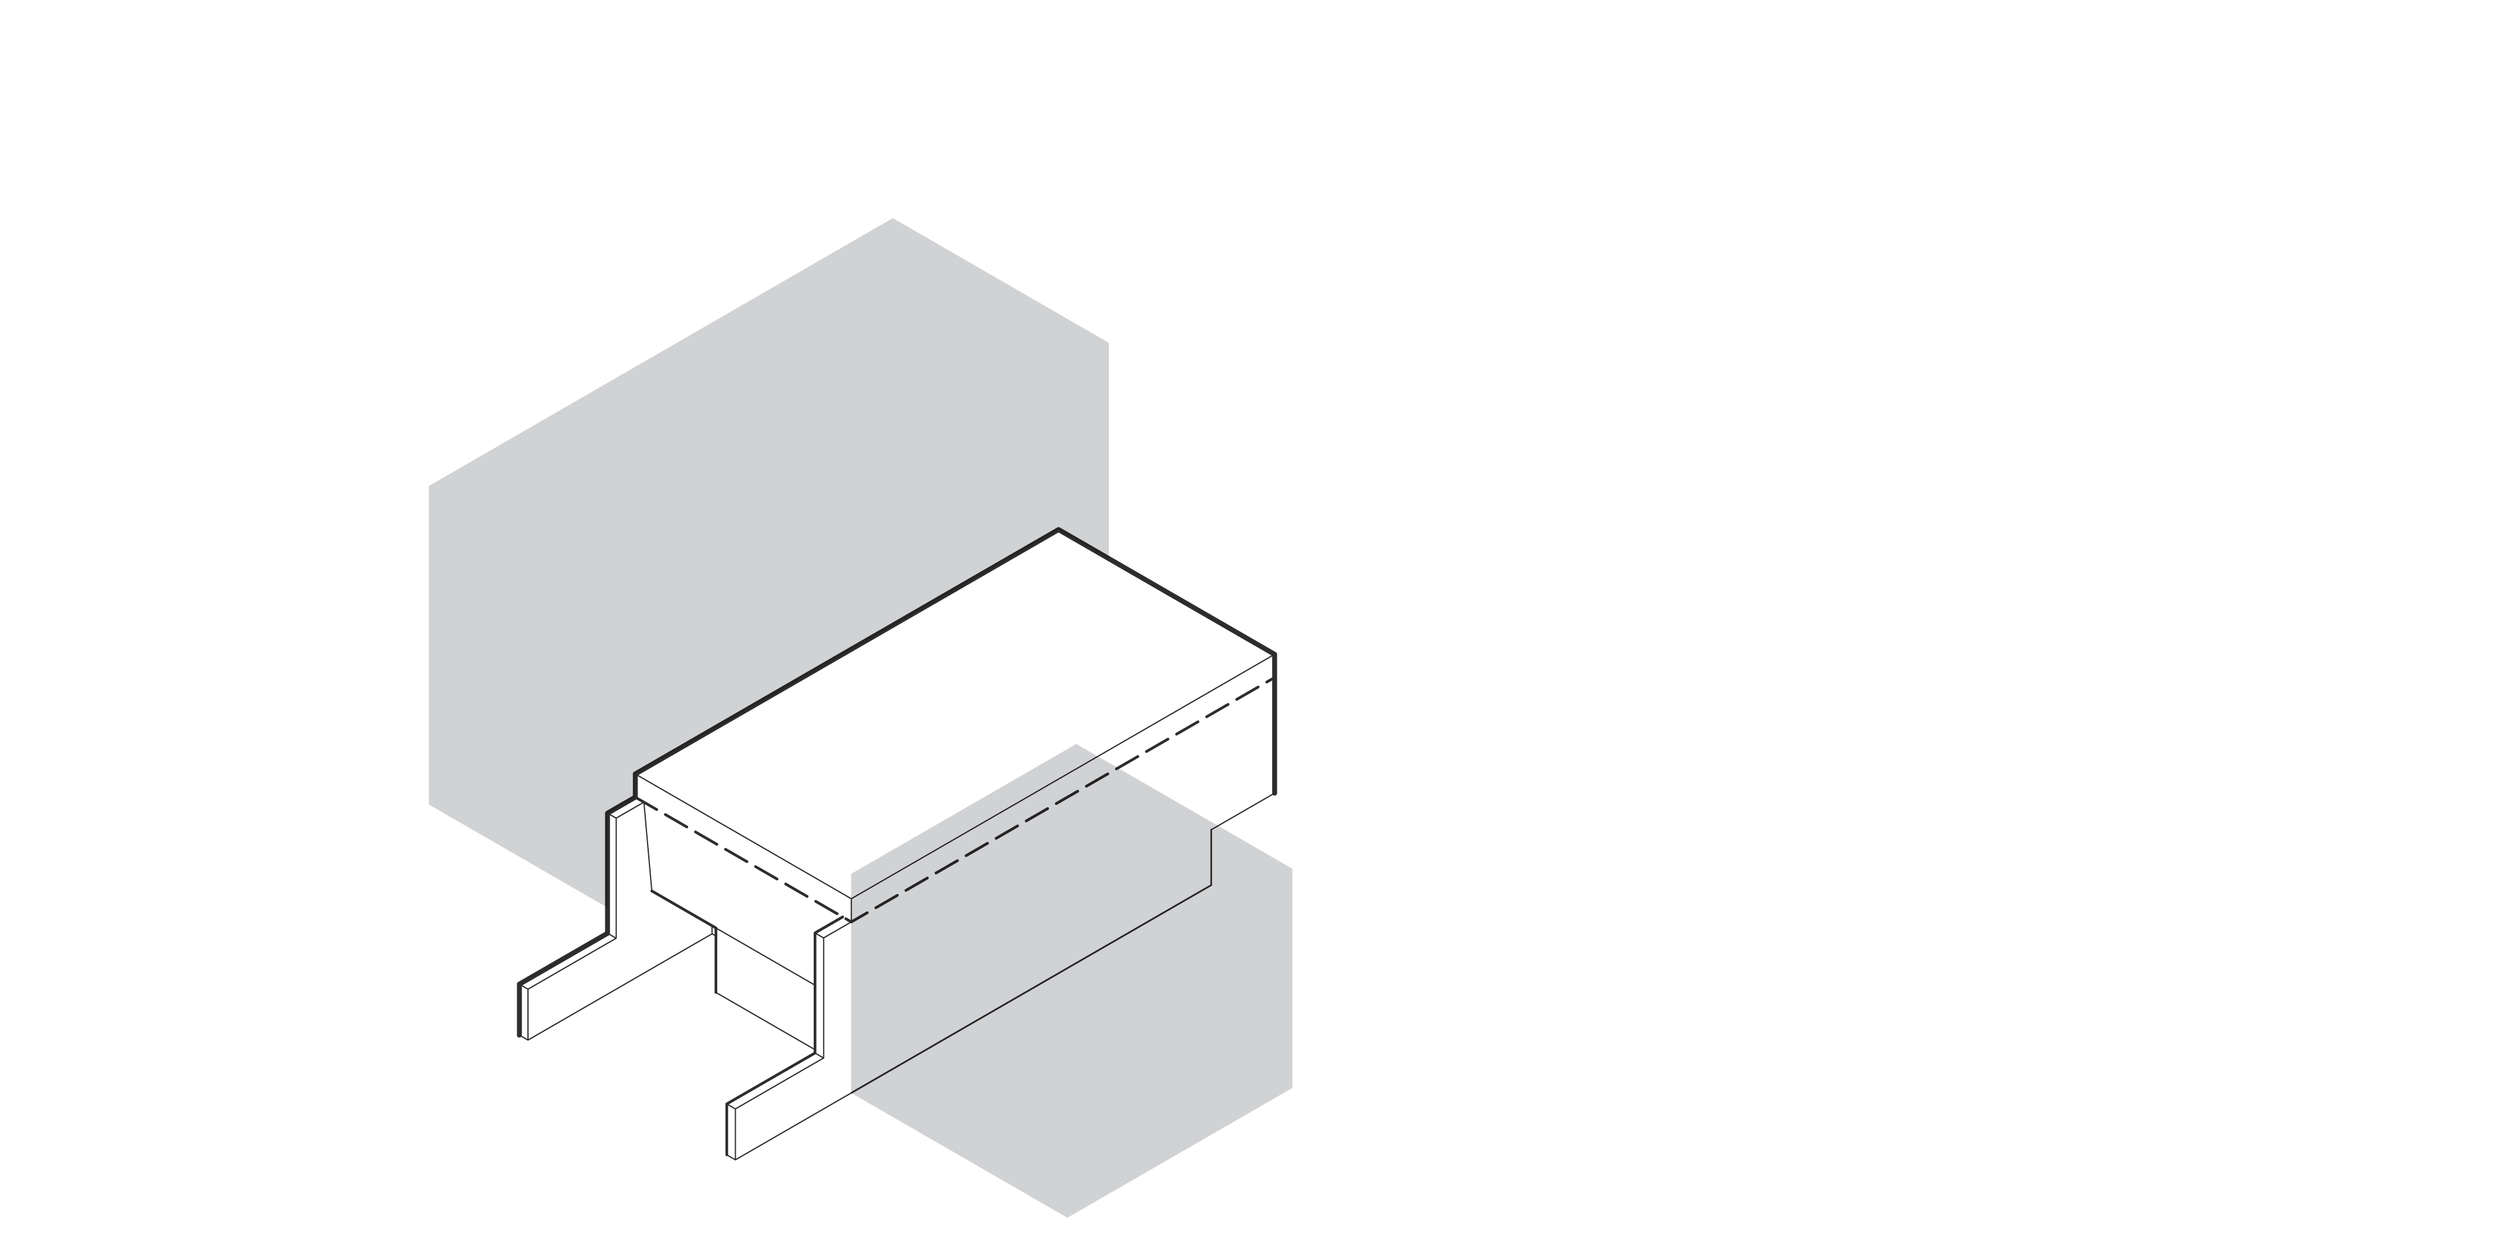 57_Highland-160413-Diagram-03-01.jpg